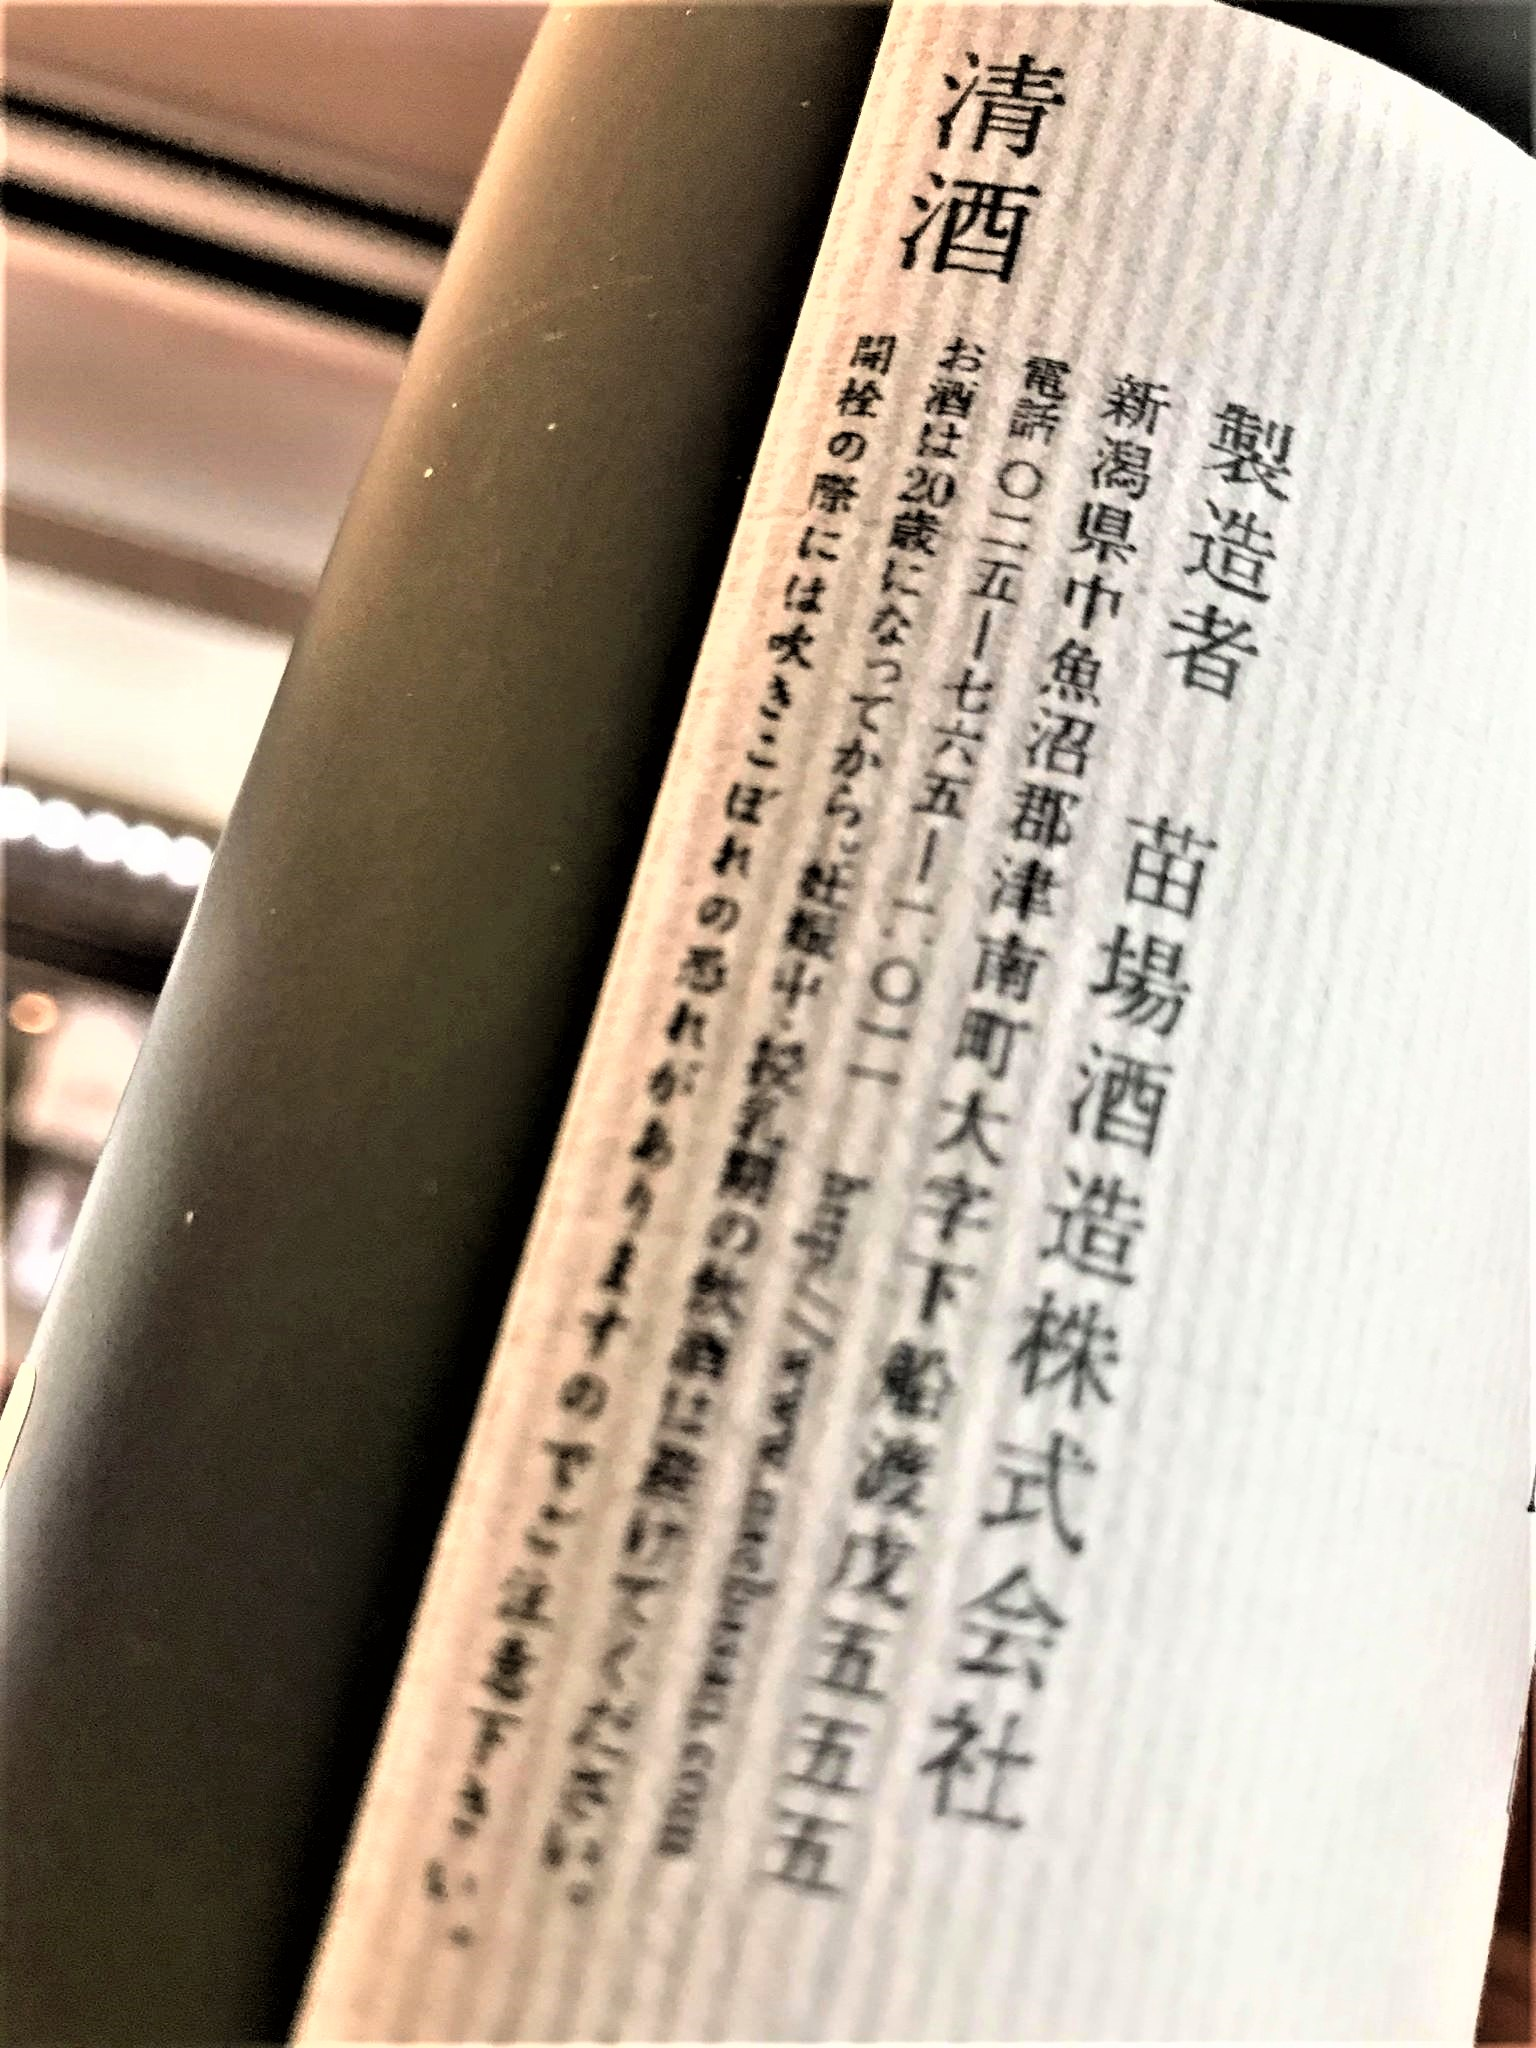 【日本酒】醸す森『kamosu mori』純米大吟醸生酒 五百万石50磨き 蔵元特別限定蔵出し 令和1BY🆕_e0173738_20372767.jpg